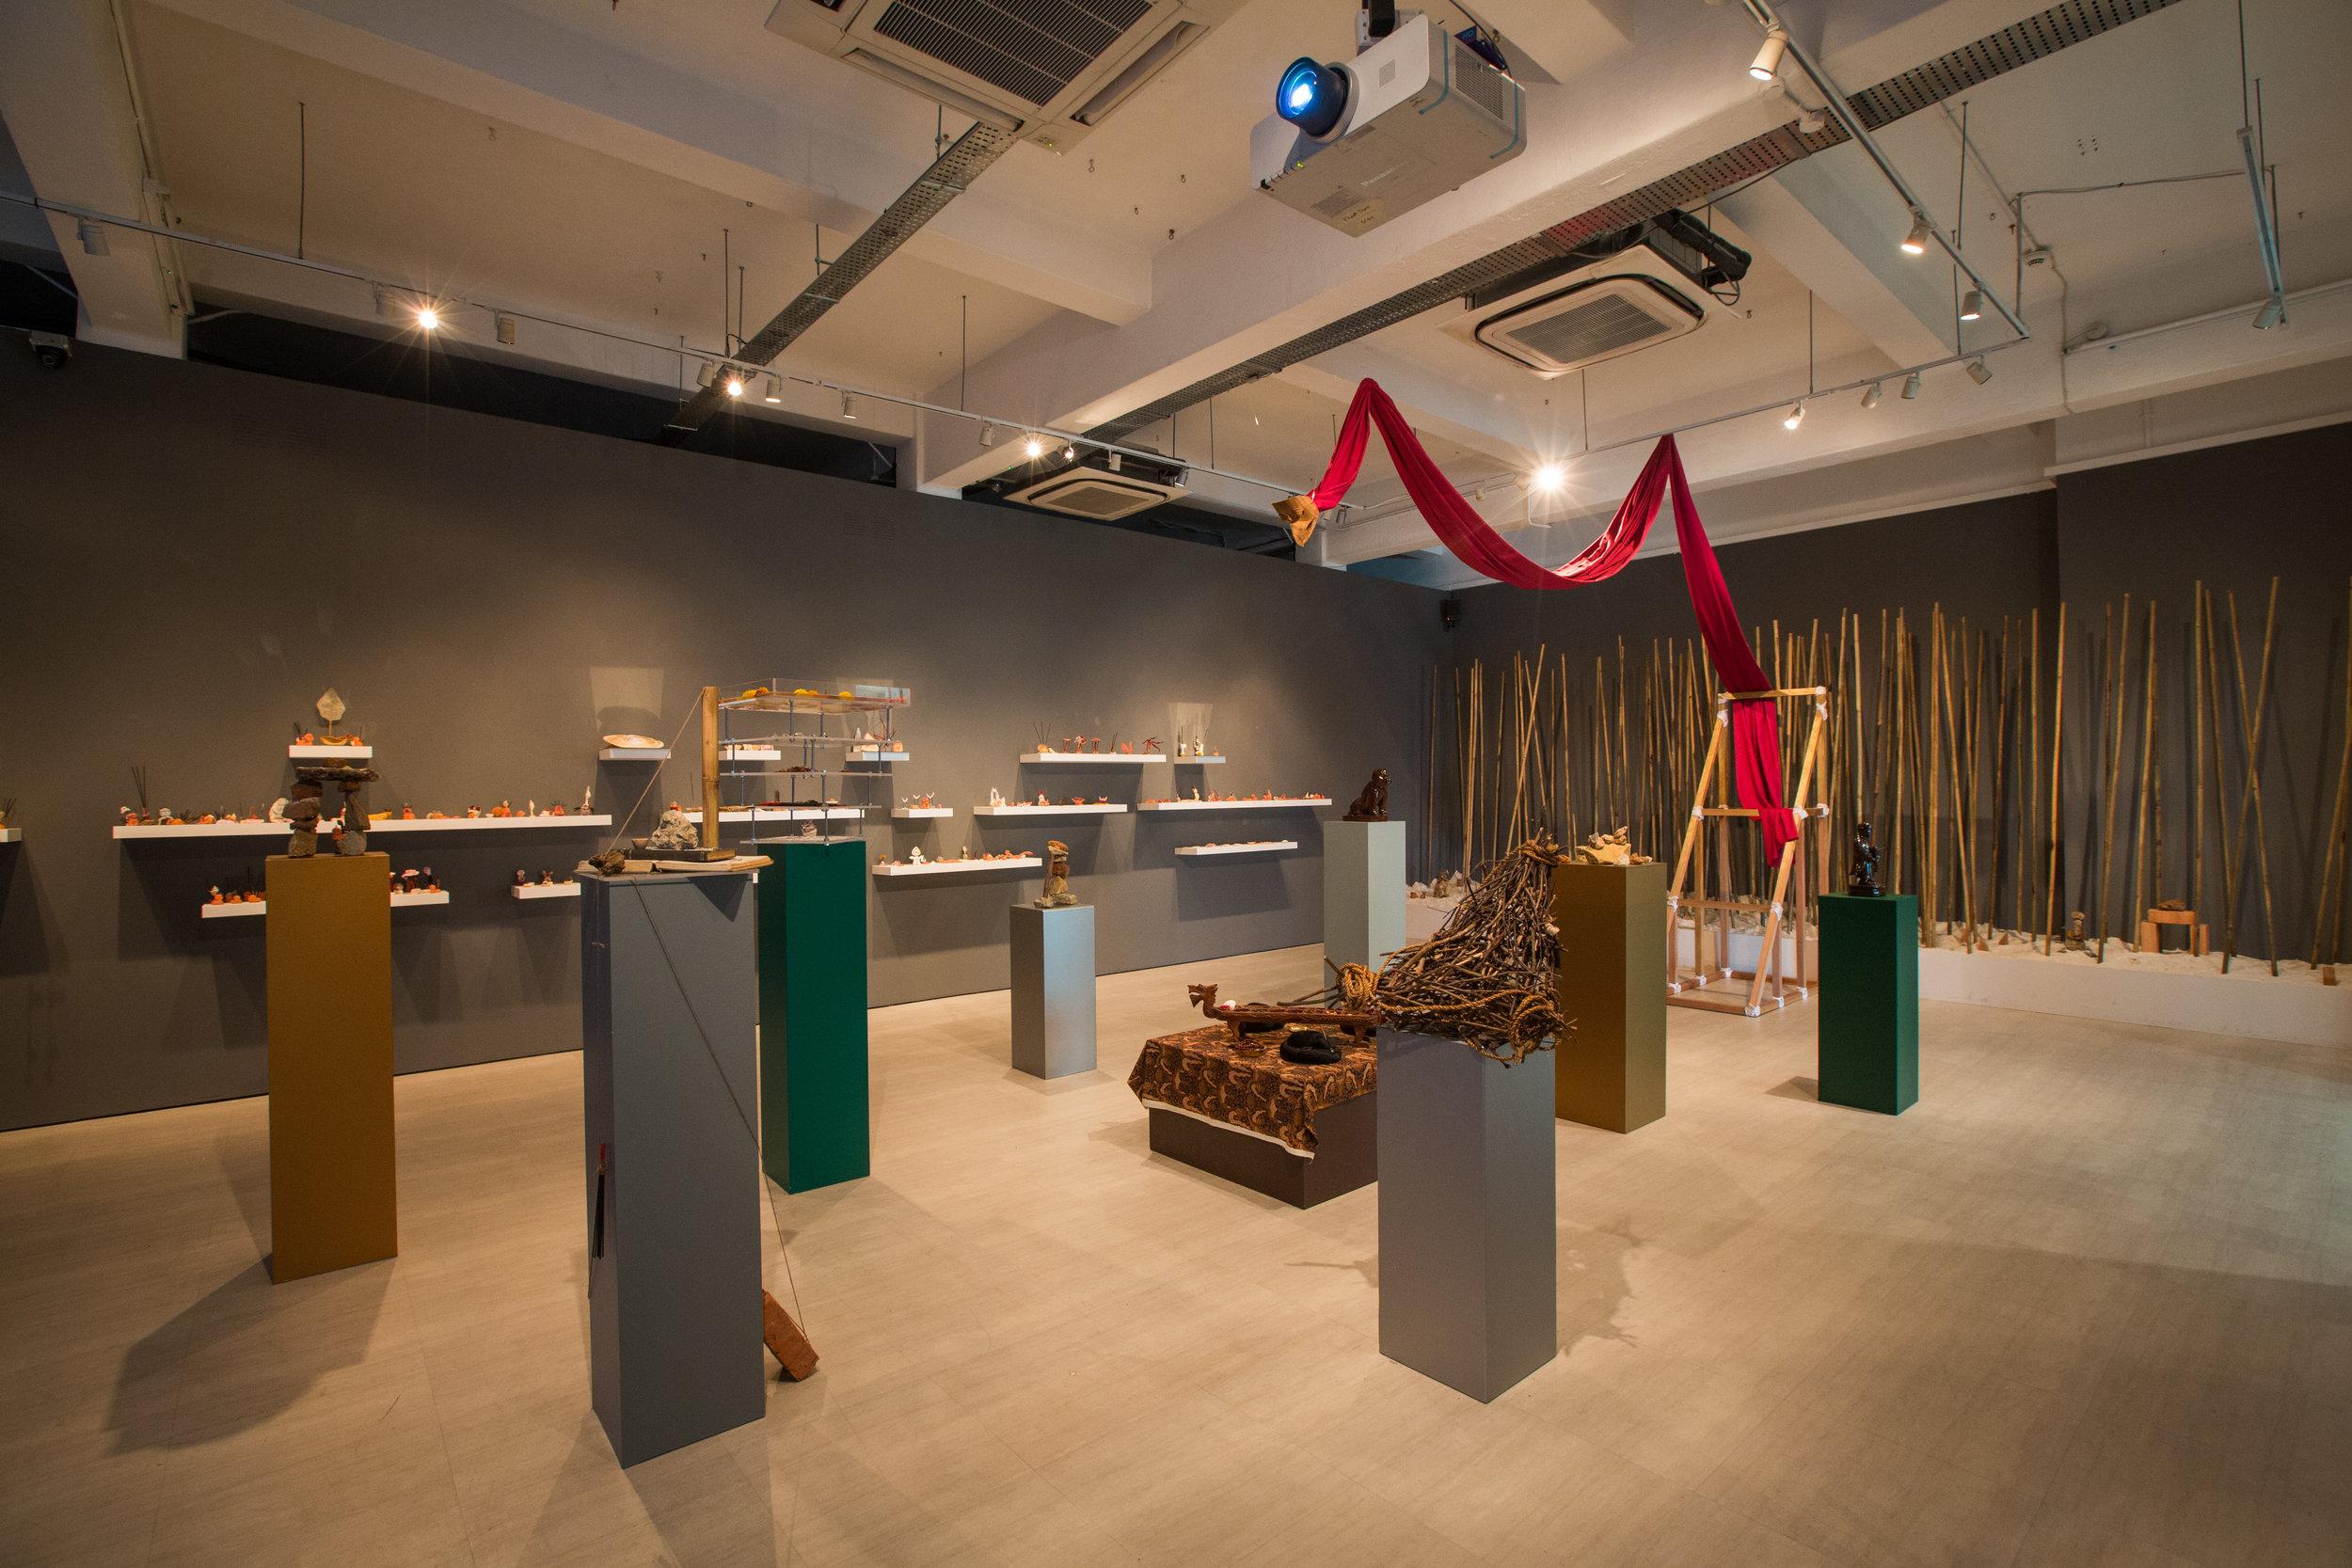 Pragmatic Prayers for the Kala at the Threshold , Zarina Muhammad 2018, Installation View at Singapore Art Museum  Photography by Singapore Art Museum